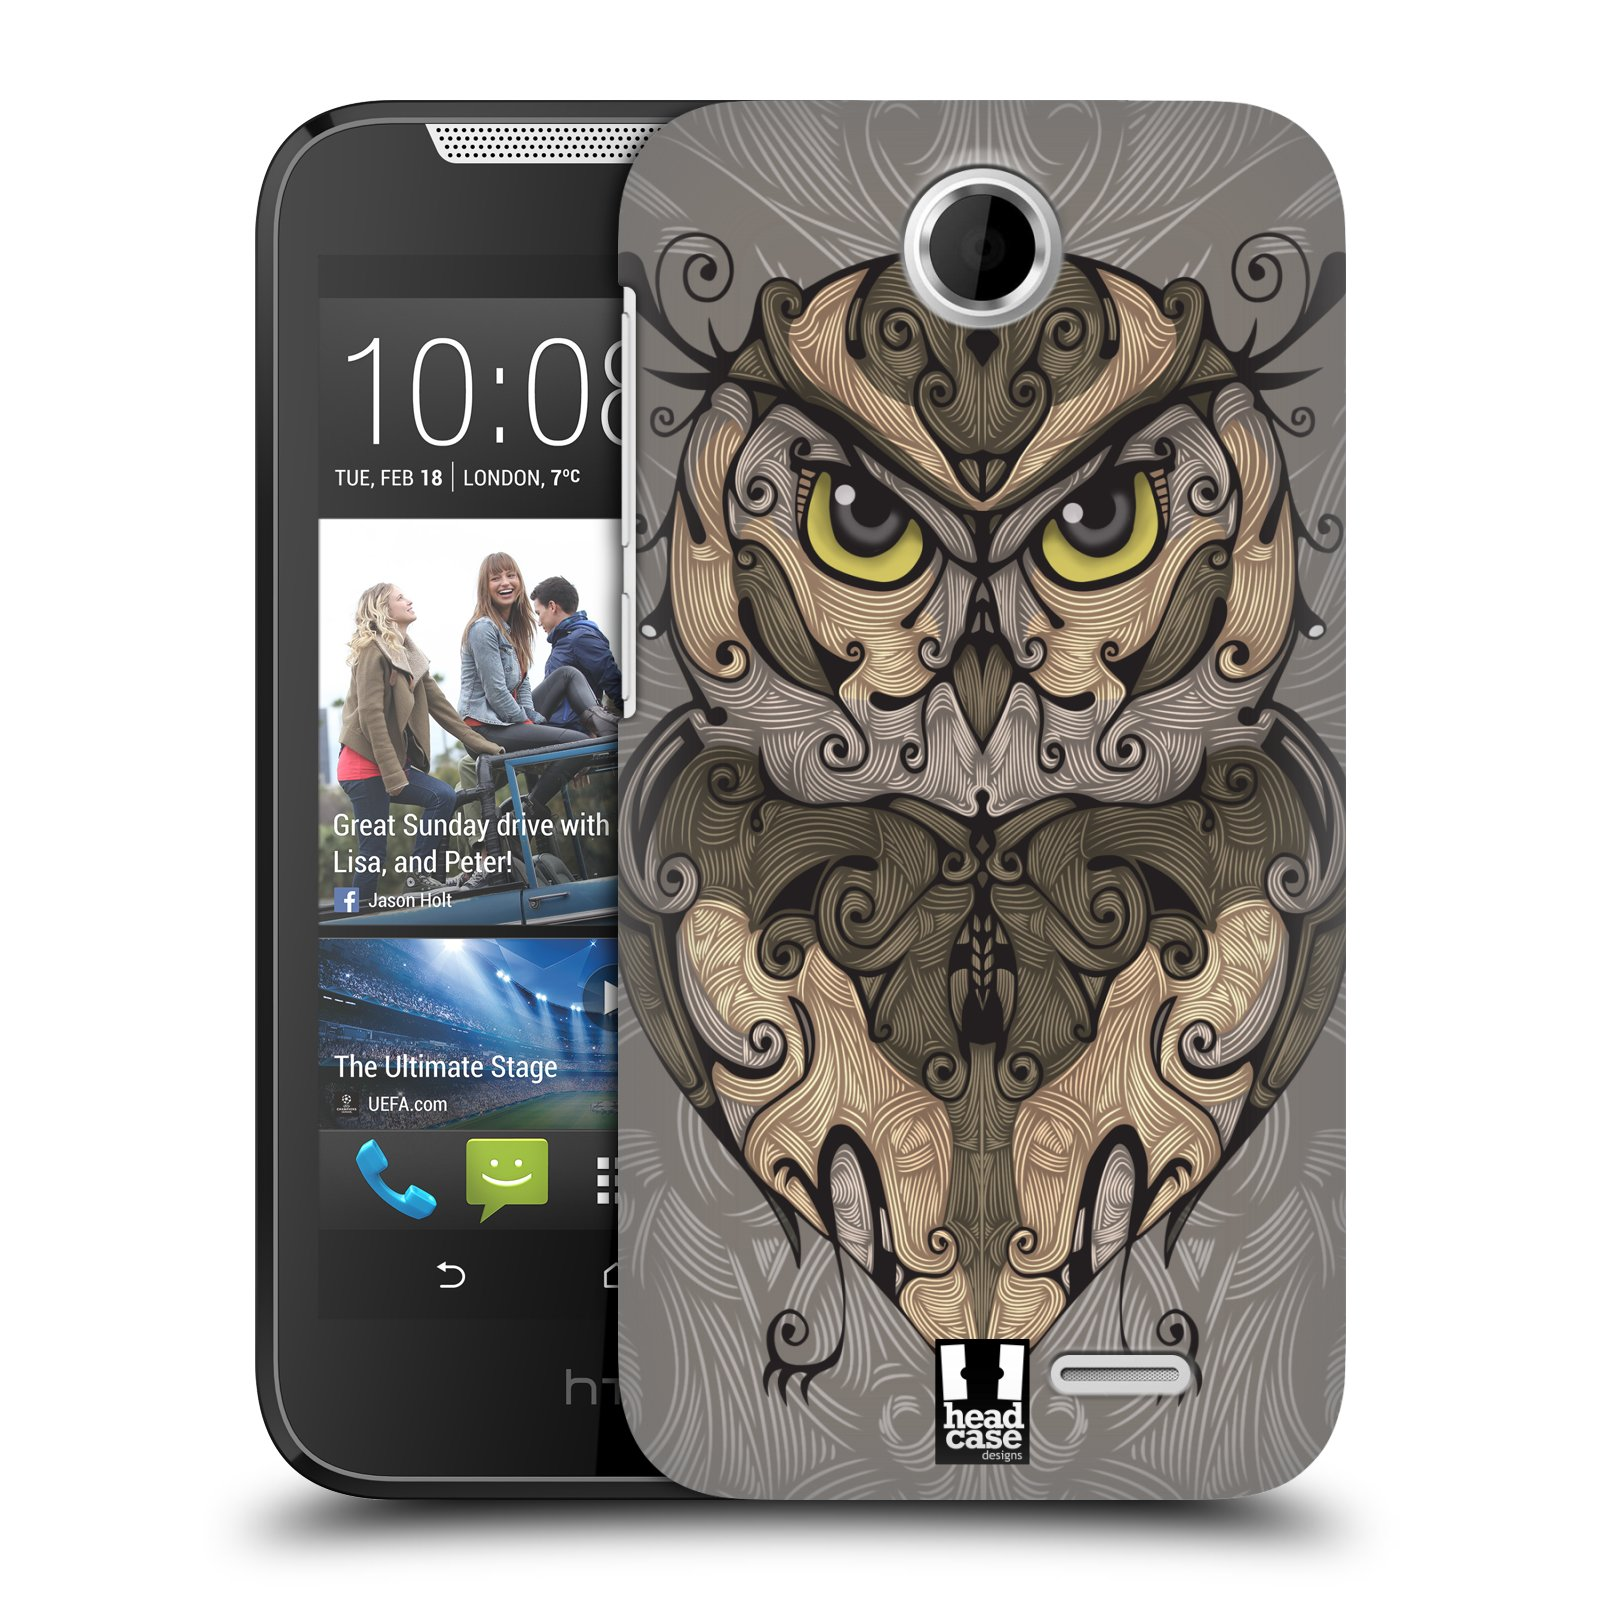 HEAD CASE plastový obal na mobil HTC Desire 310 vzor kudrlinky zvíře sova